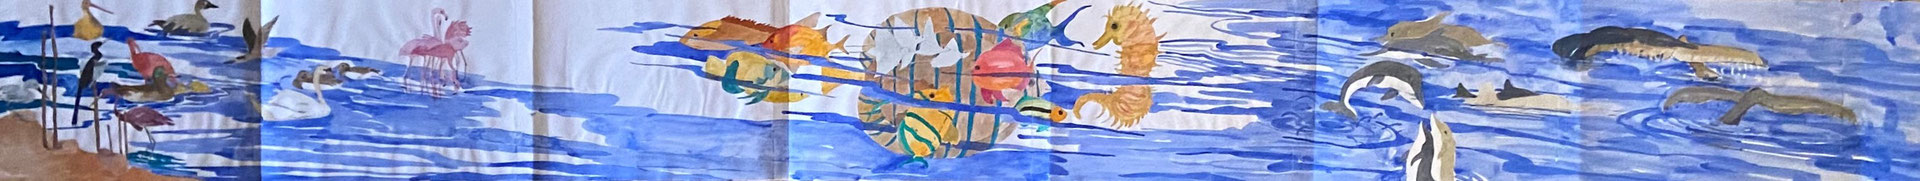 Wasserlandschaft, Shihab Vaippipadath, undatiert, Aquarell, Papier, 210x21cm, ID1751